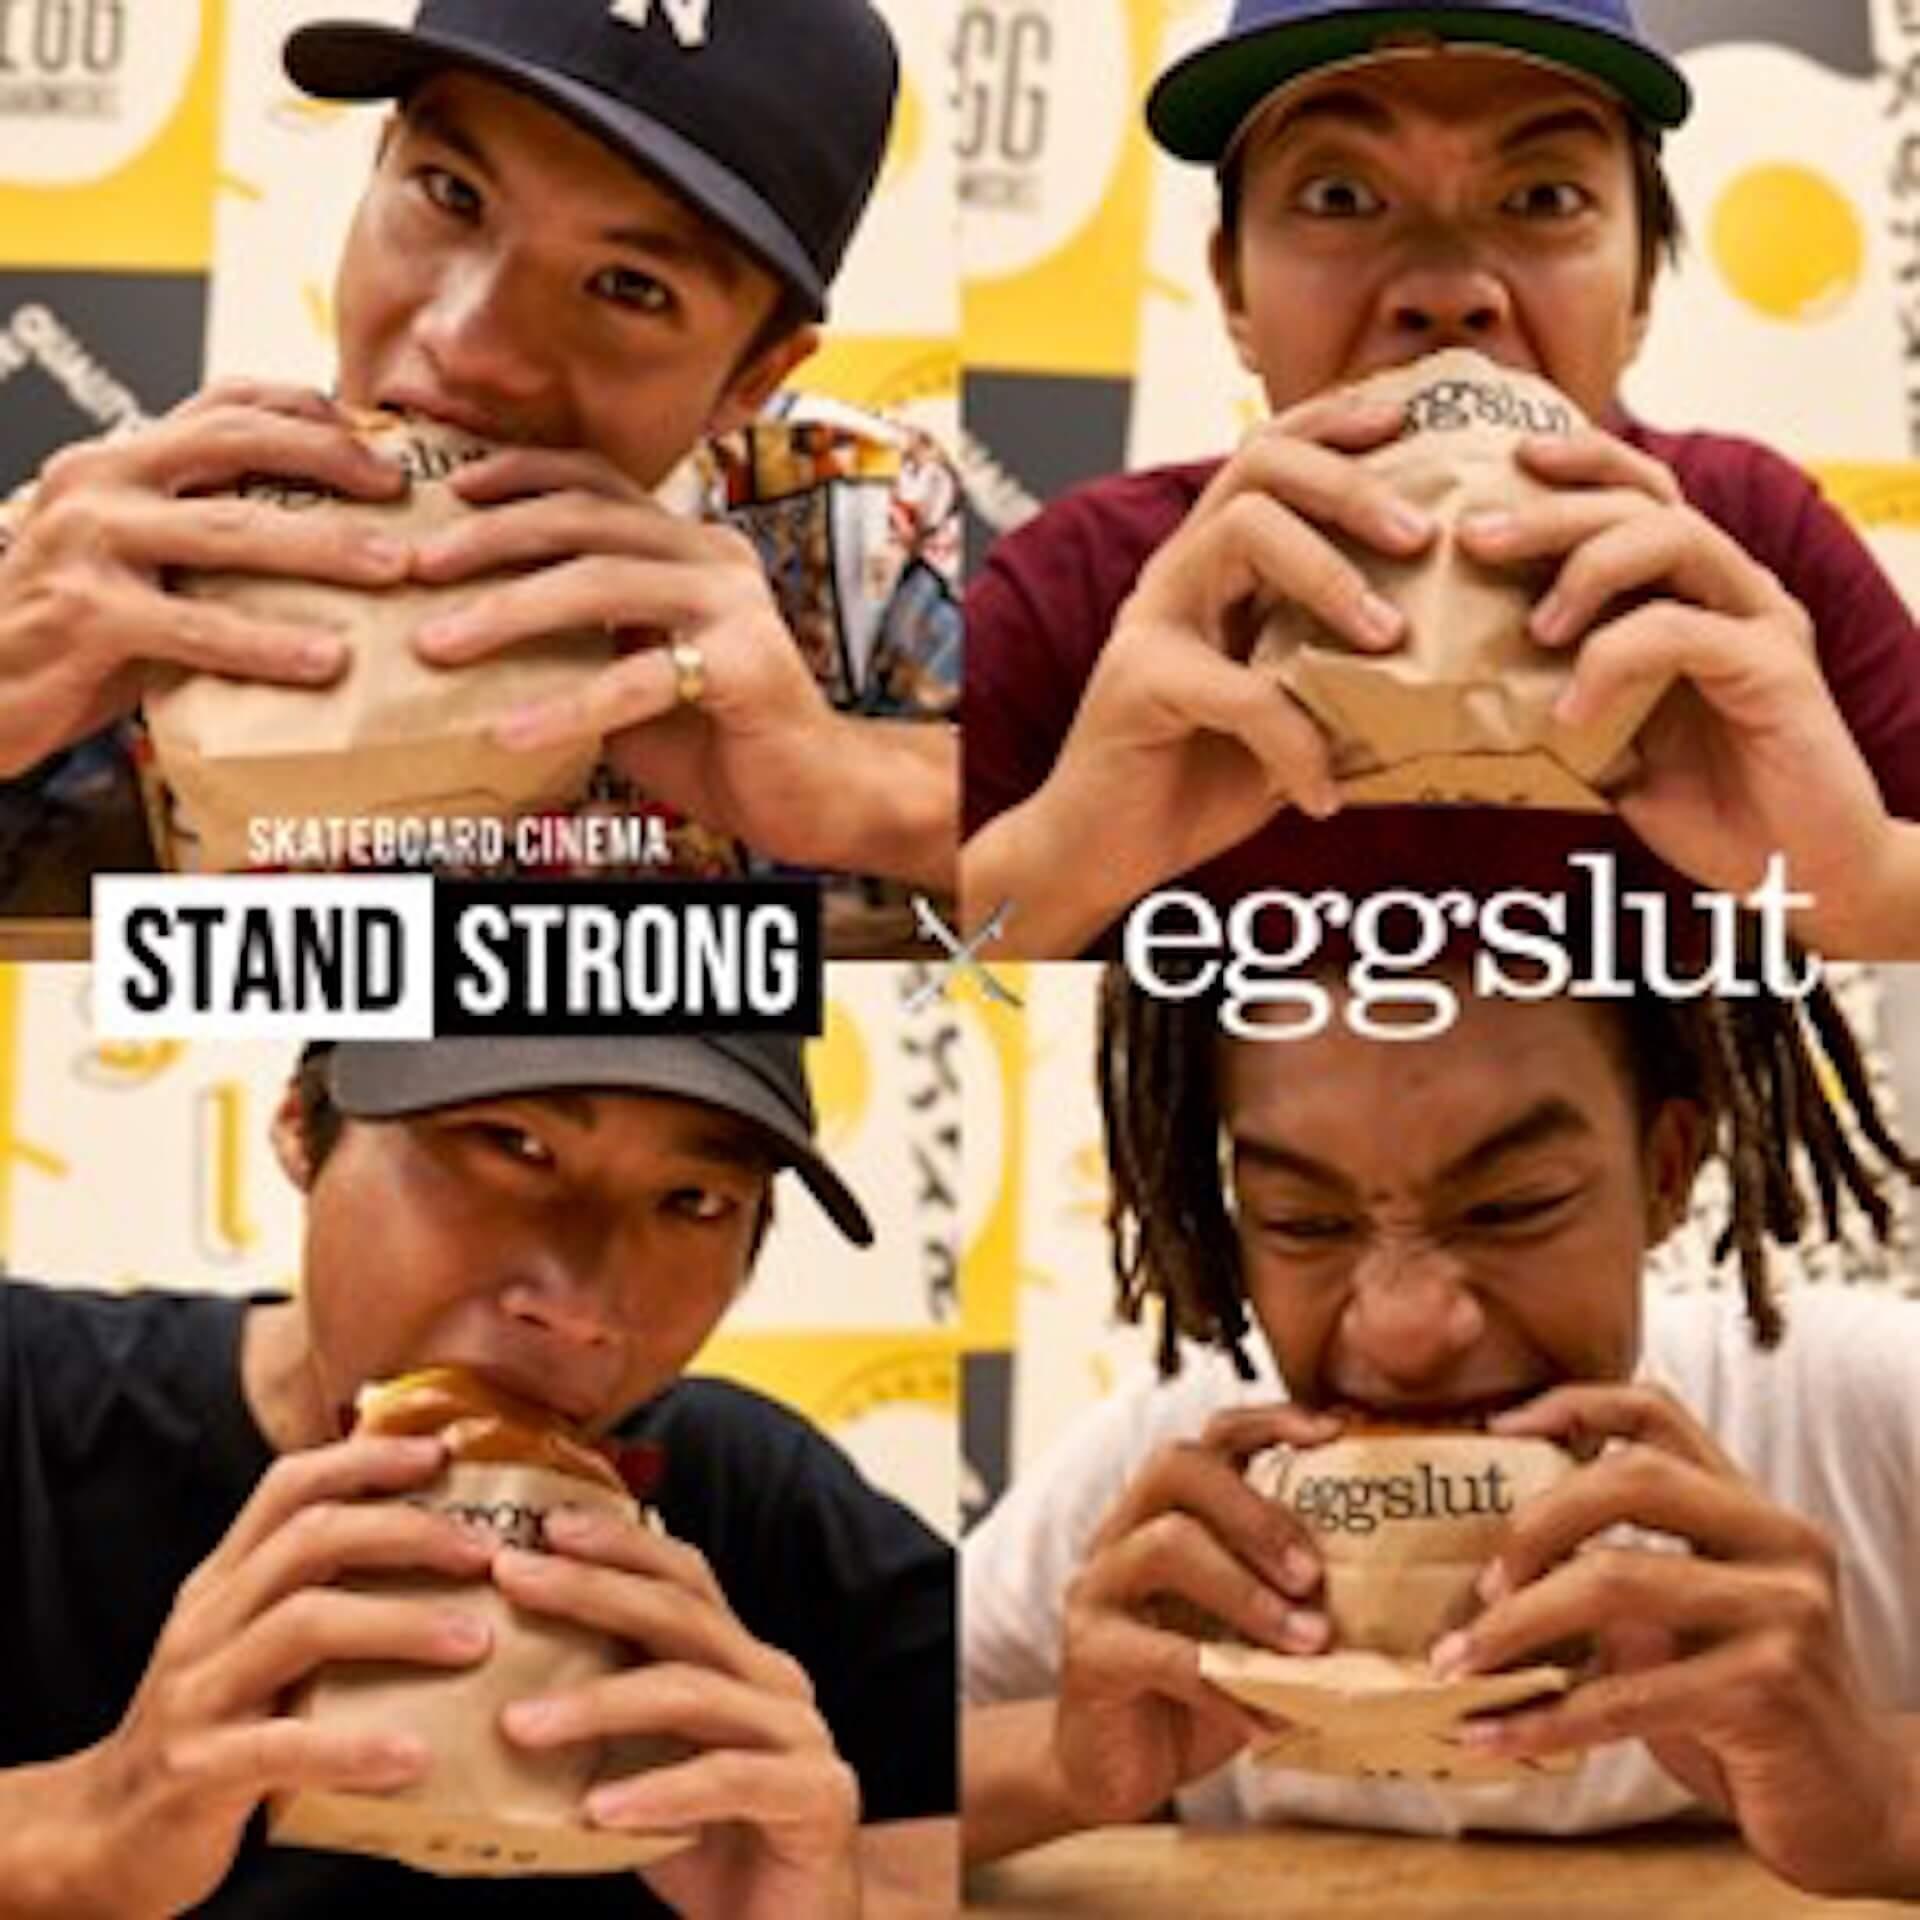 LA発の大人気卵料理専門店「eggslut」がMIYASHITA PARK内にオープン!映画『STAND STRONG』とのコラボキャンペーンも gourmet200729_eggslut_6